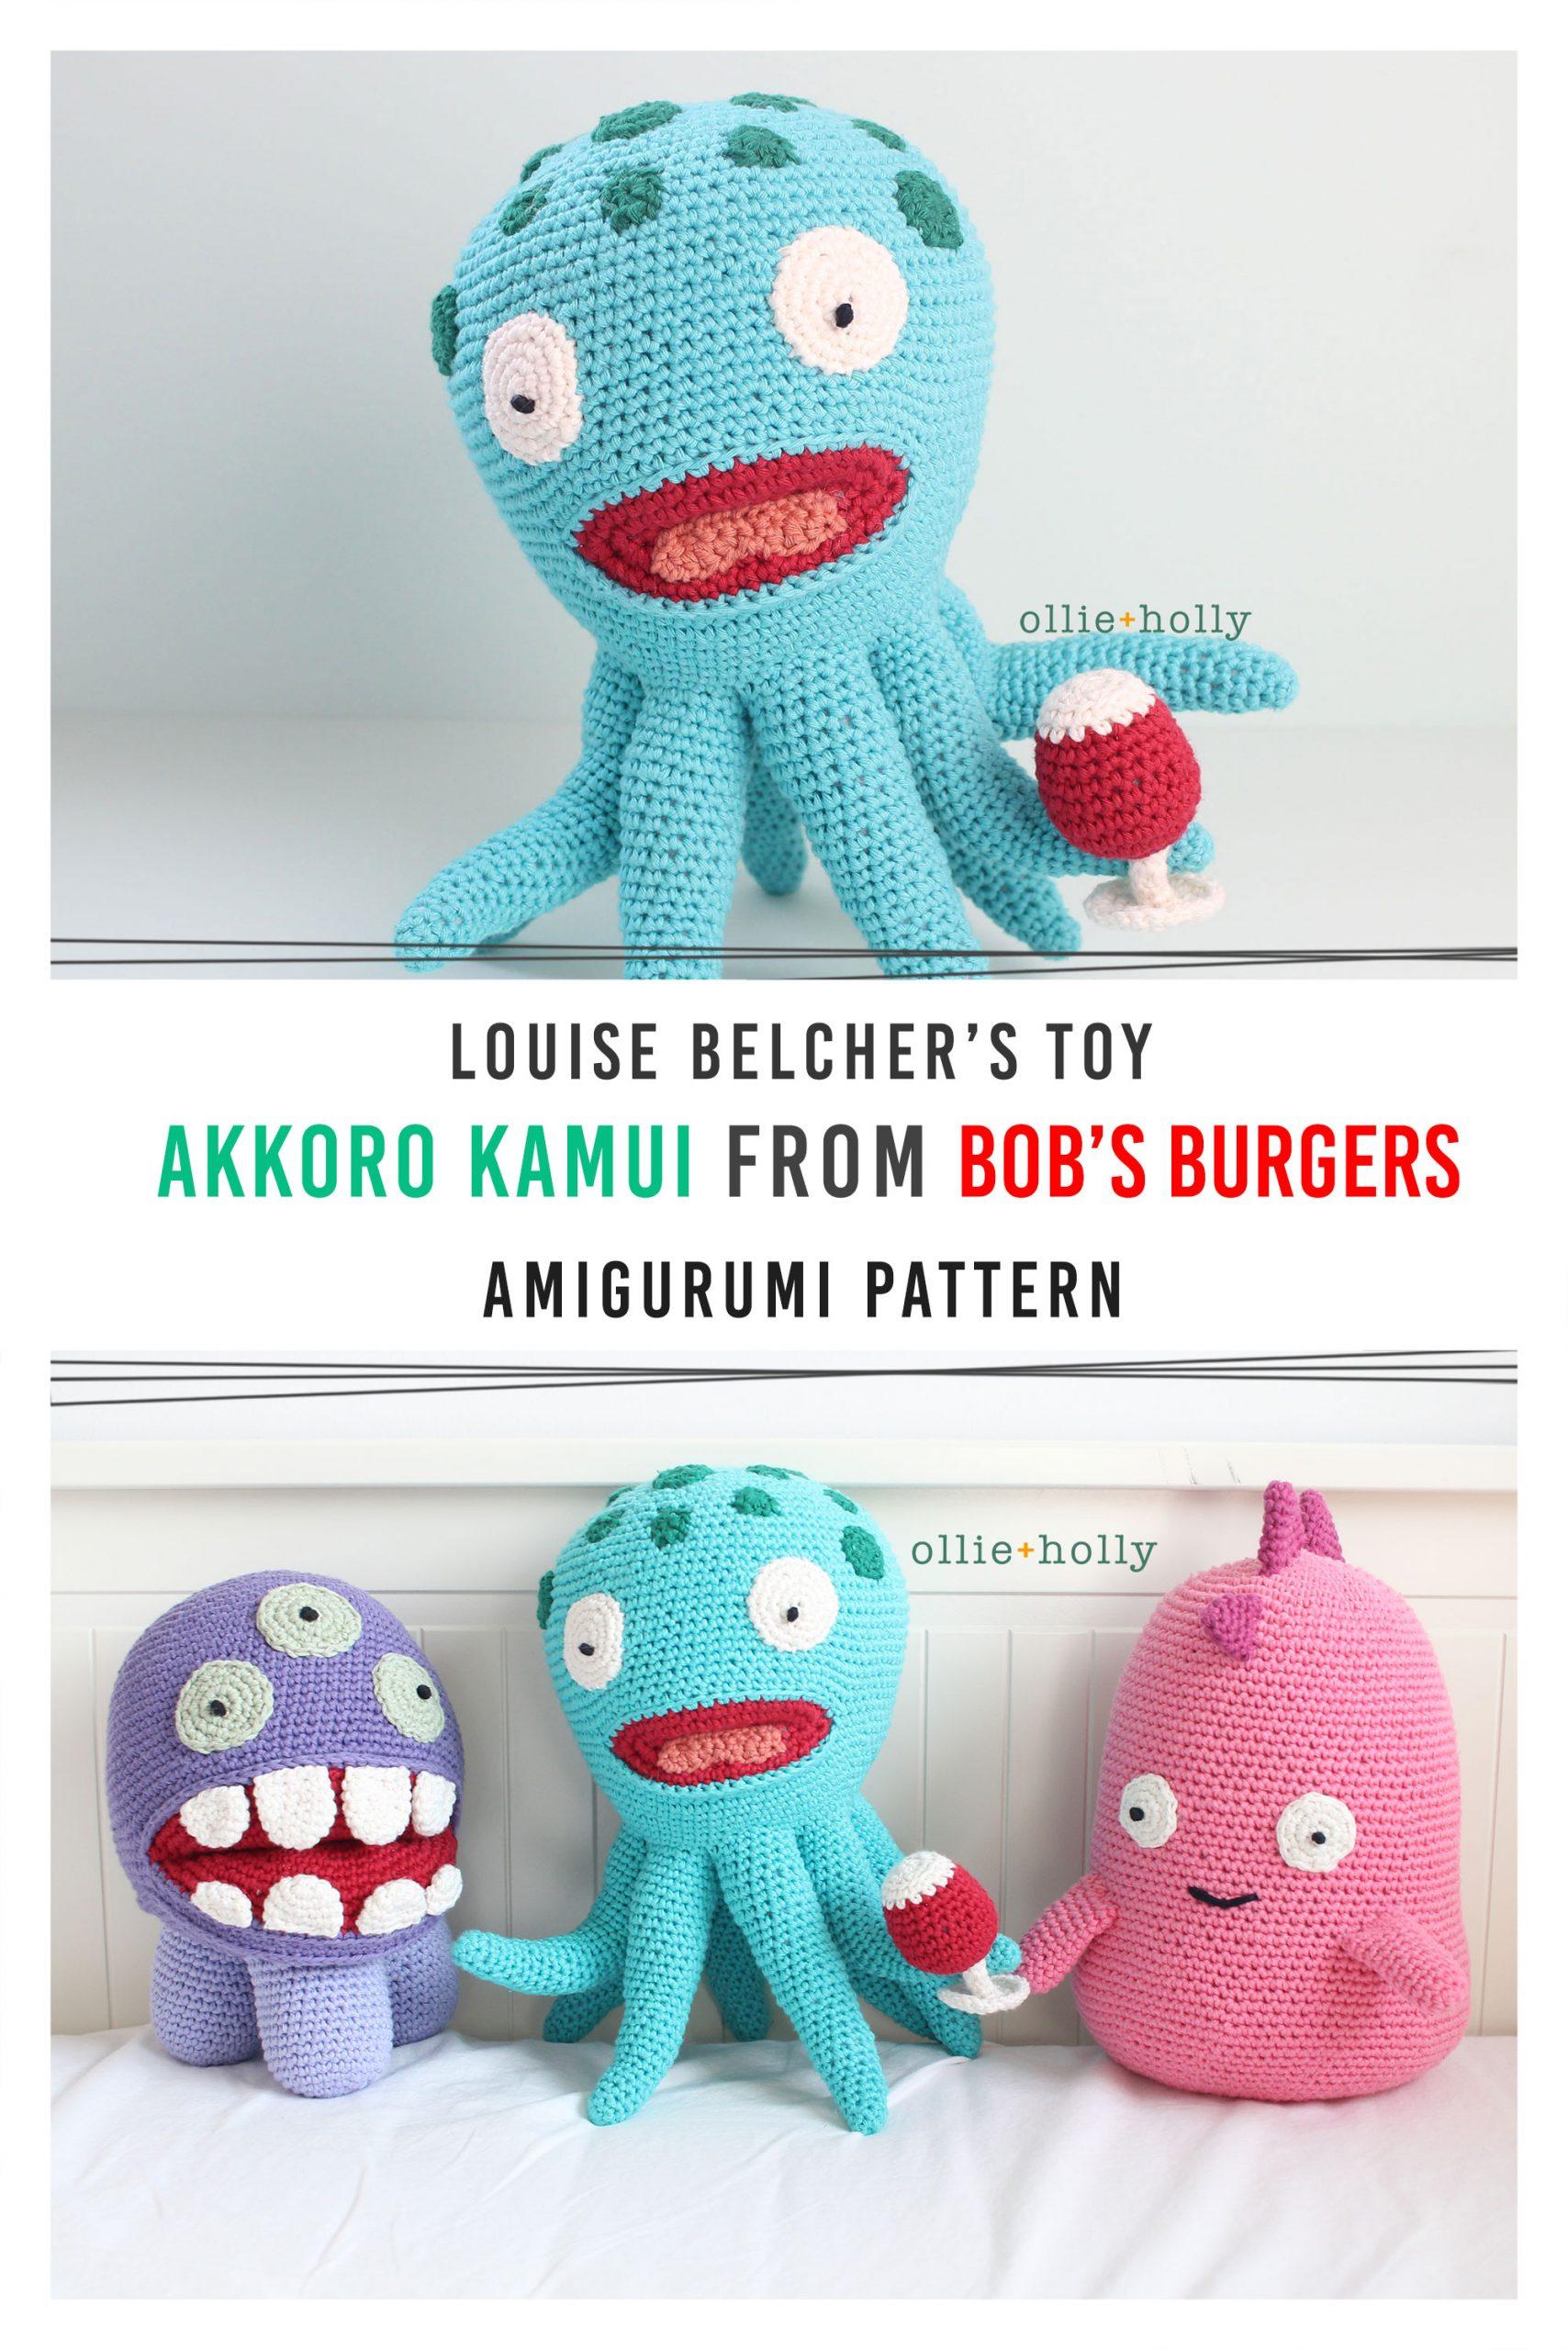 Louise Belcher's Stuffed Animal Akkoro Kamui (Bob's Burgers) Amigurumi Crochet Pattern